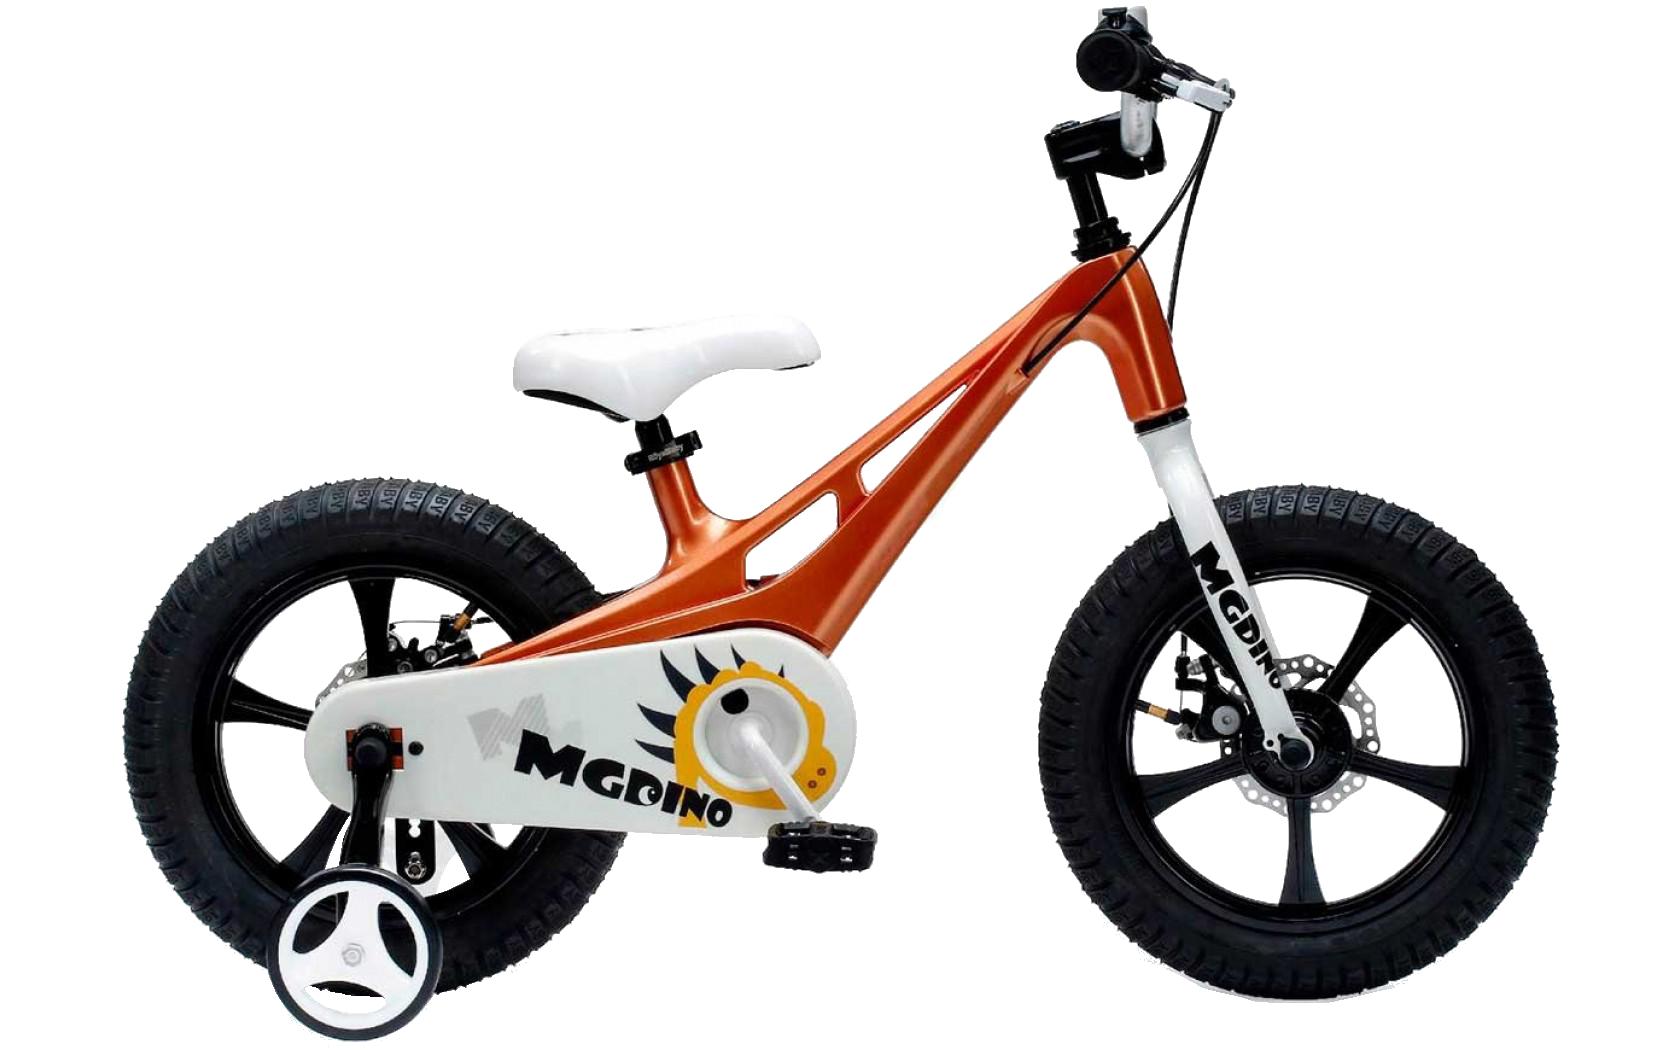 Bicicleta Infantil Royal Baby Mg Dino Rodado 14